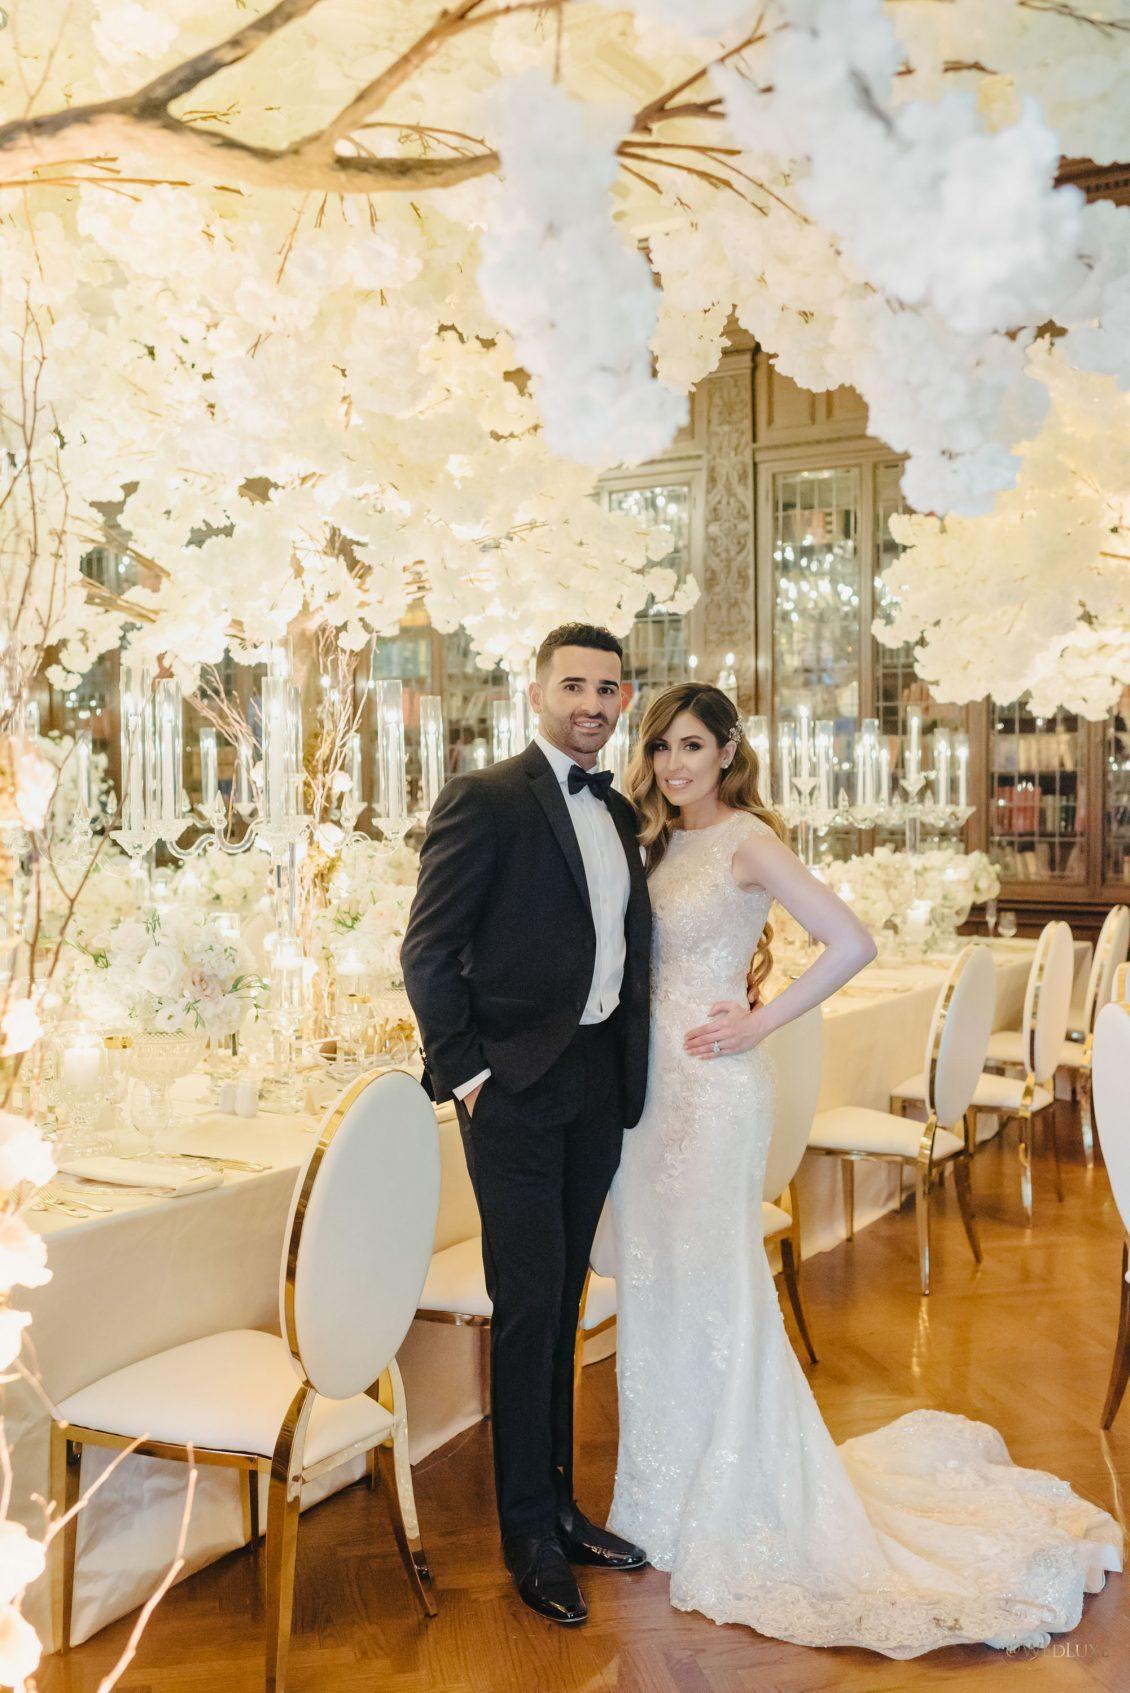 Ashley and Nazem Kadri Wedding Toronto Casa Loma Bliss Events